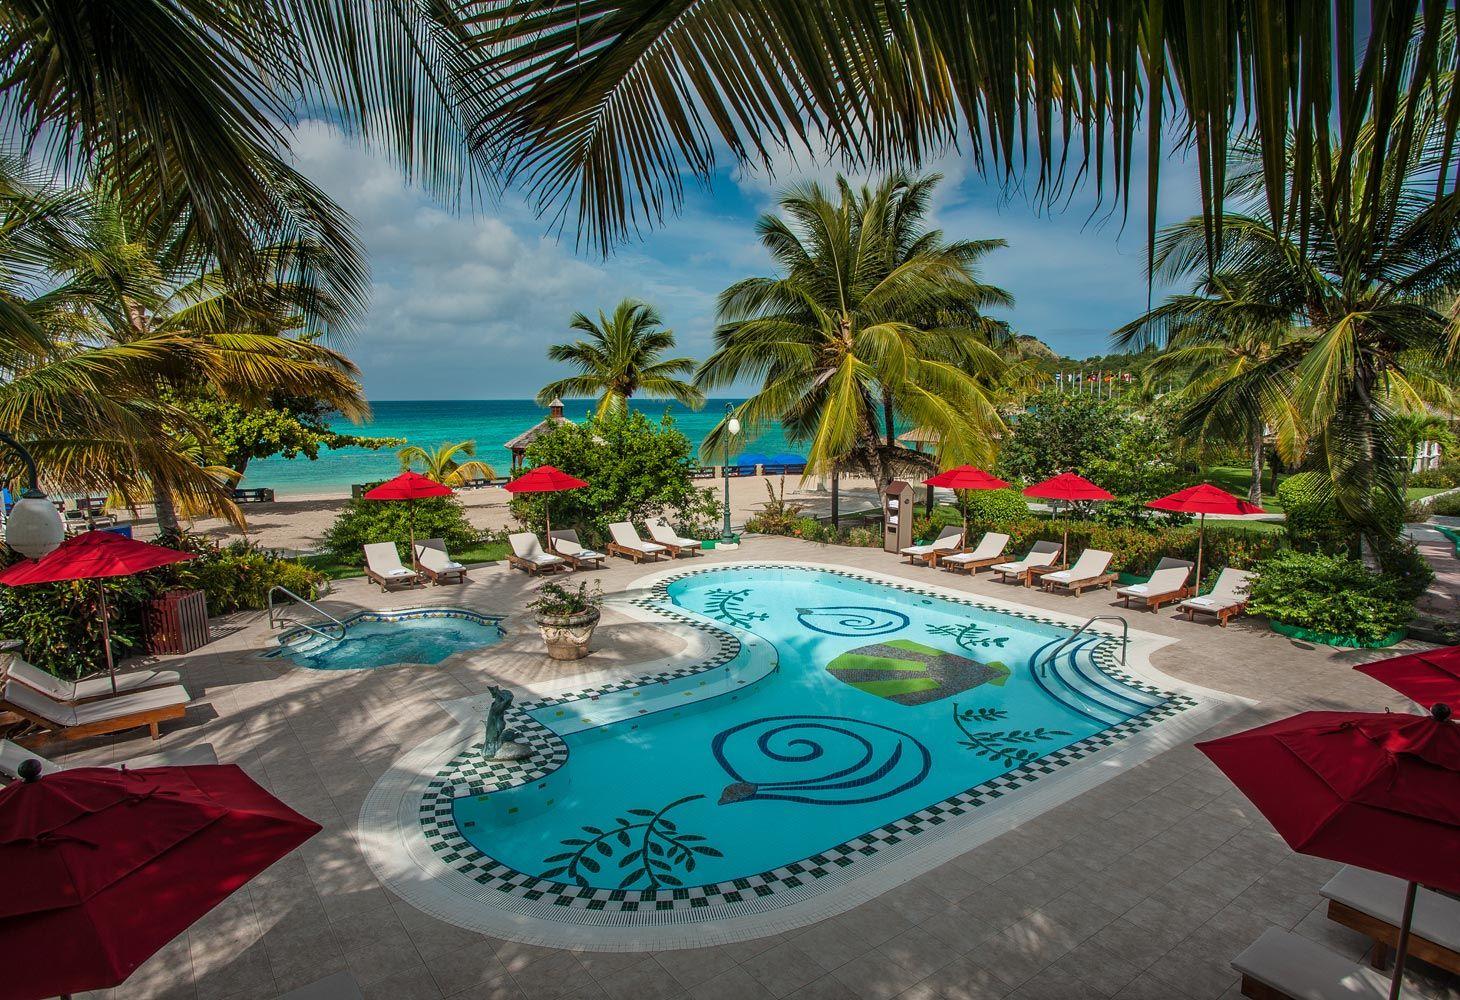 Sandals Grande Antigua Resort & Spa, Antigua, Book Now